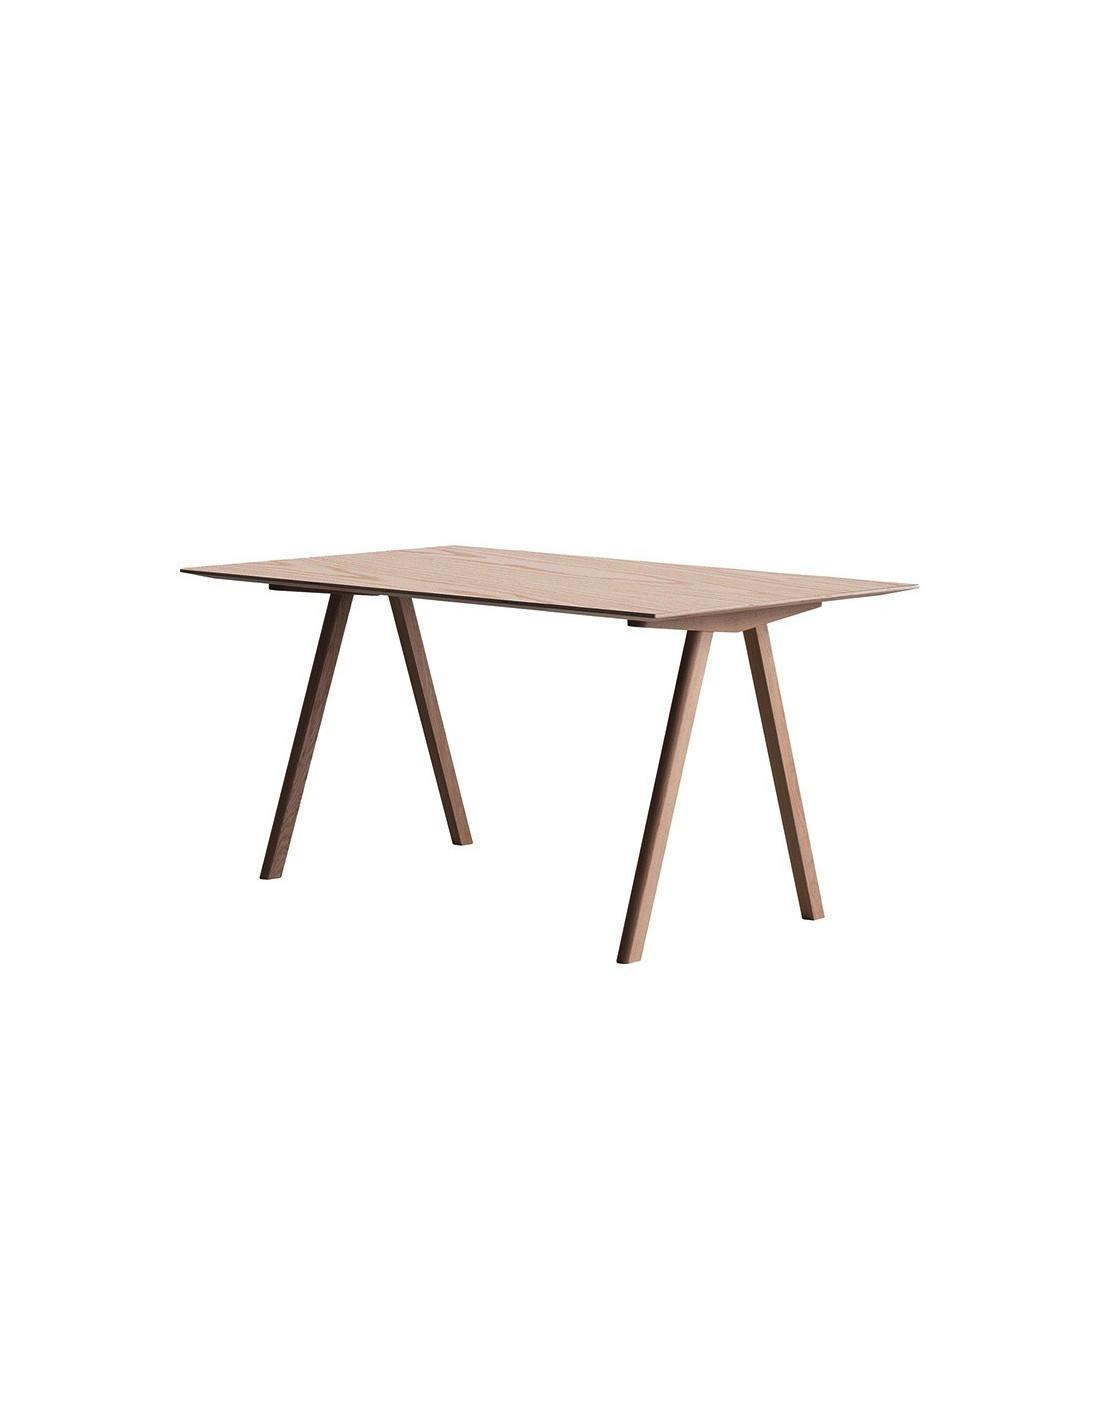 table copenhague cph10 erwan et ronan bouroullec. Black Bedroom Furniture Sets. Home Design Ideas